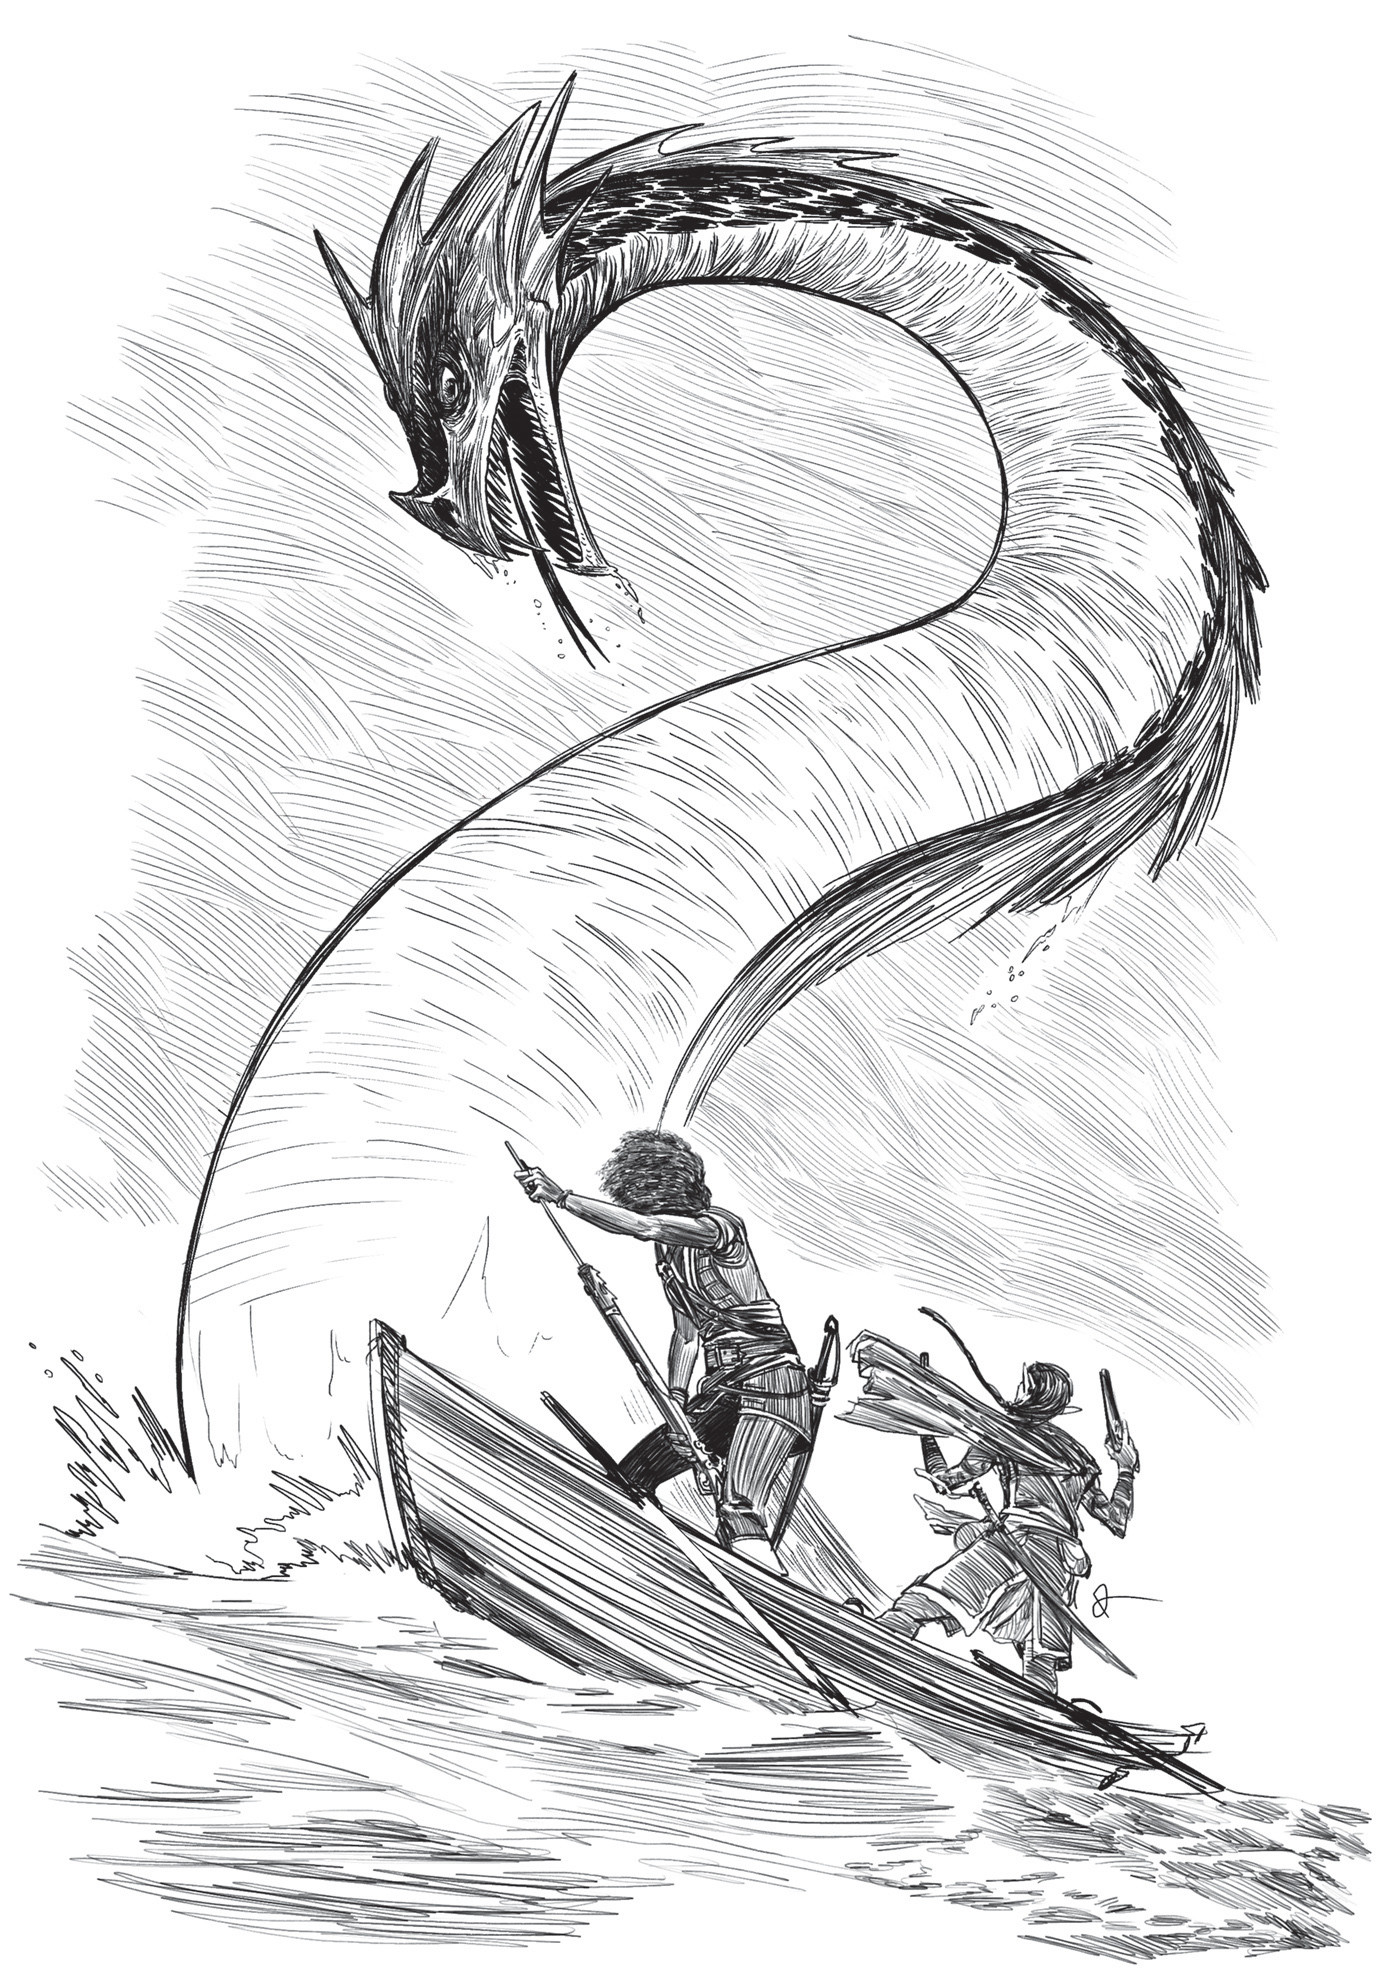 Dan ramos monstro serpente marinha